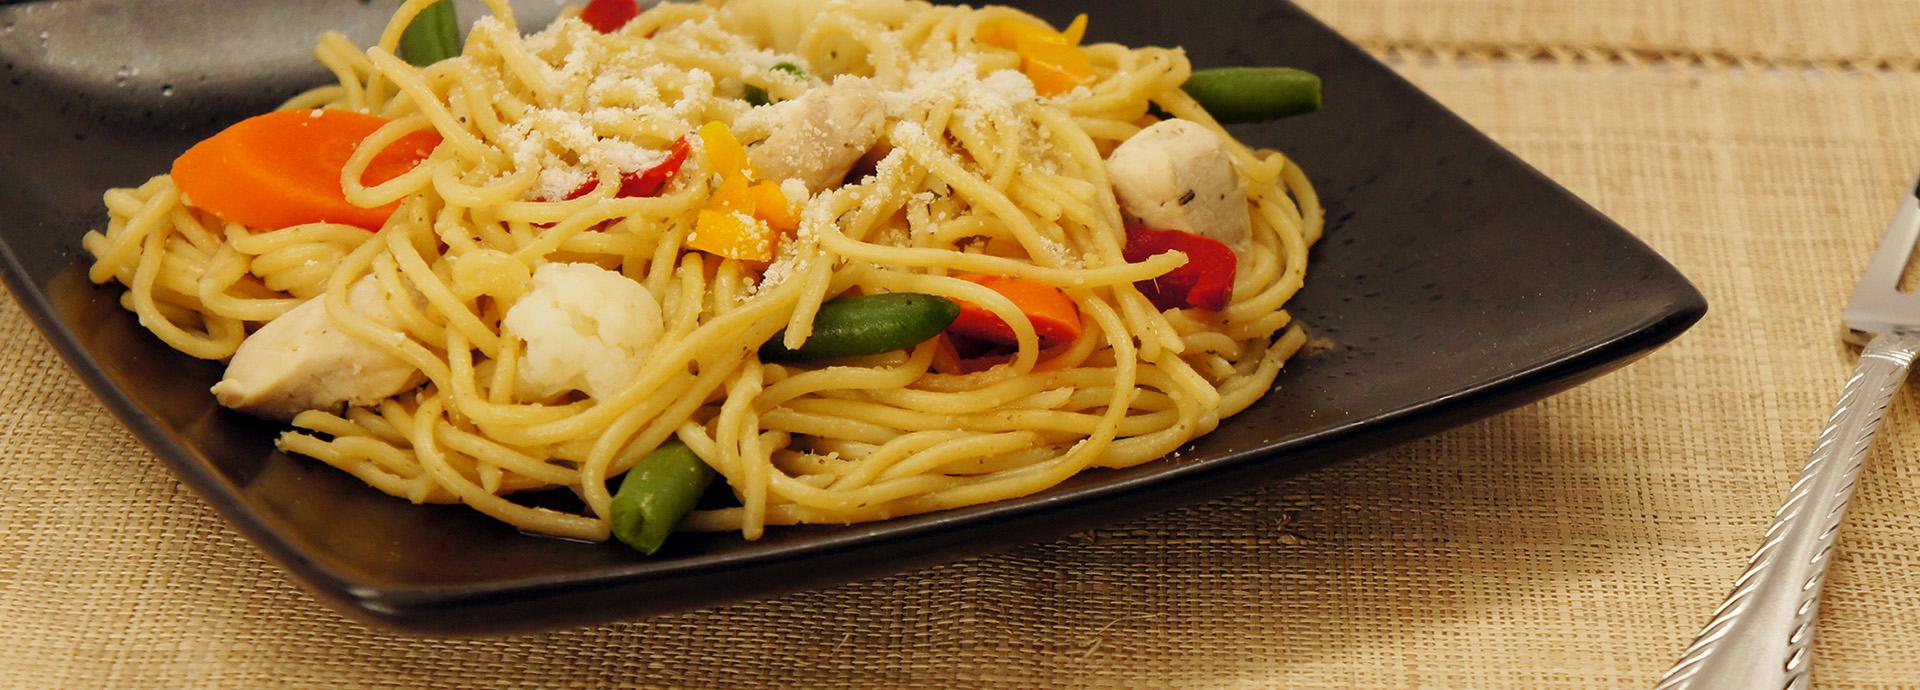 Skinner 174 Easy Chicken And Herb Spaghetti